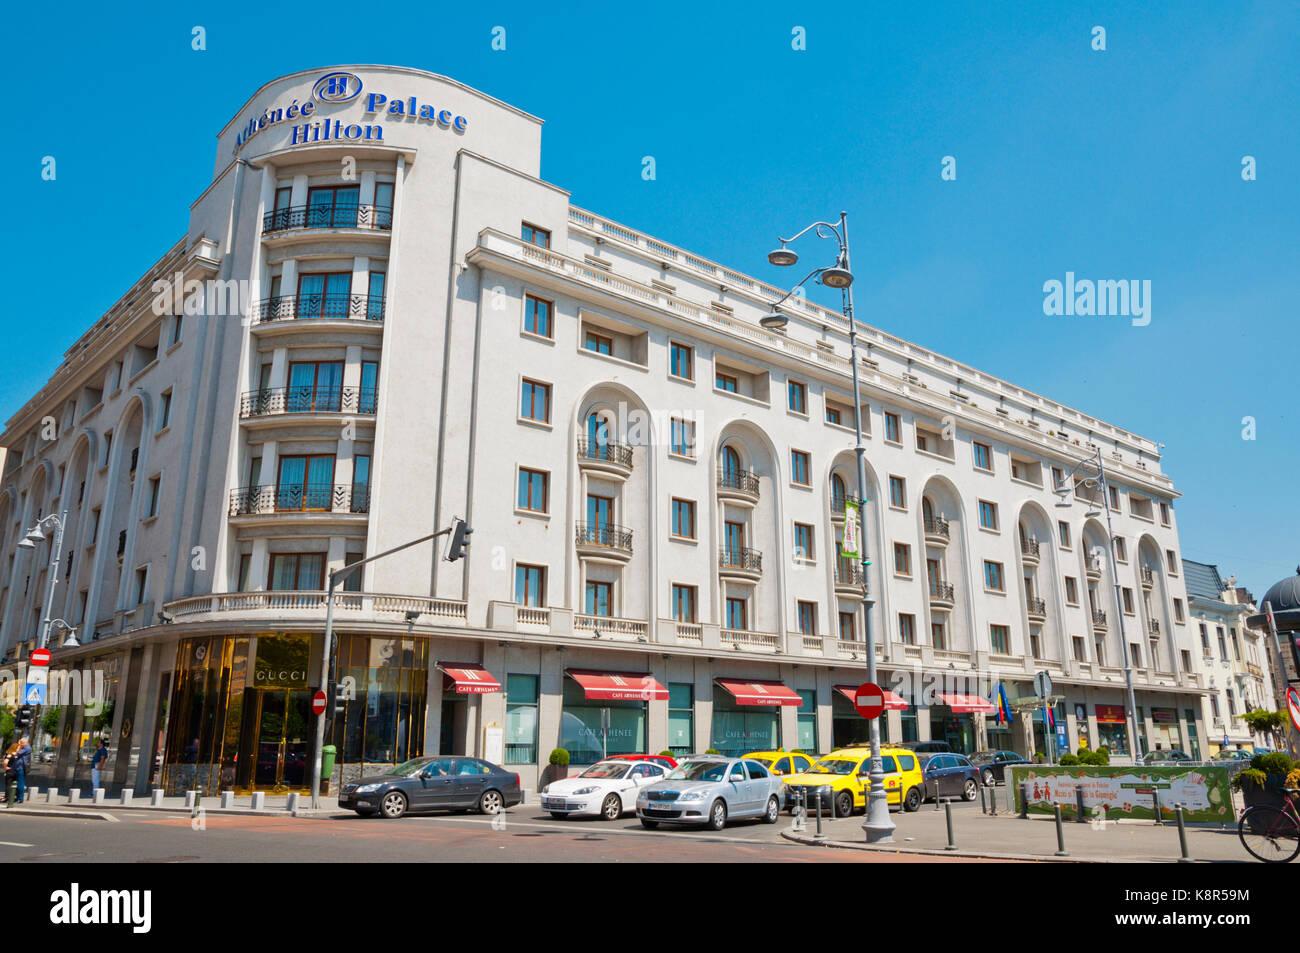 Athenee Palace Hilton, Calea Victoriei, Bucharest, Romania - Stock Image